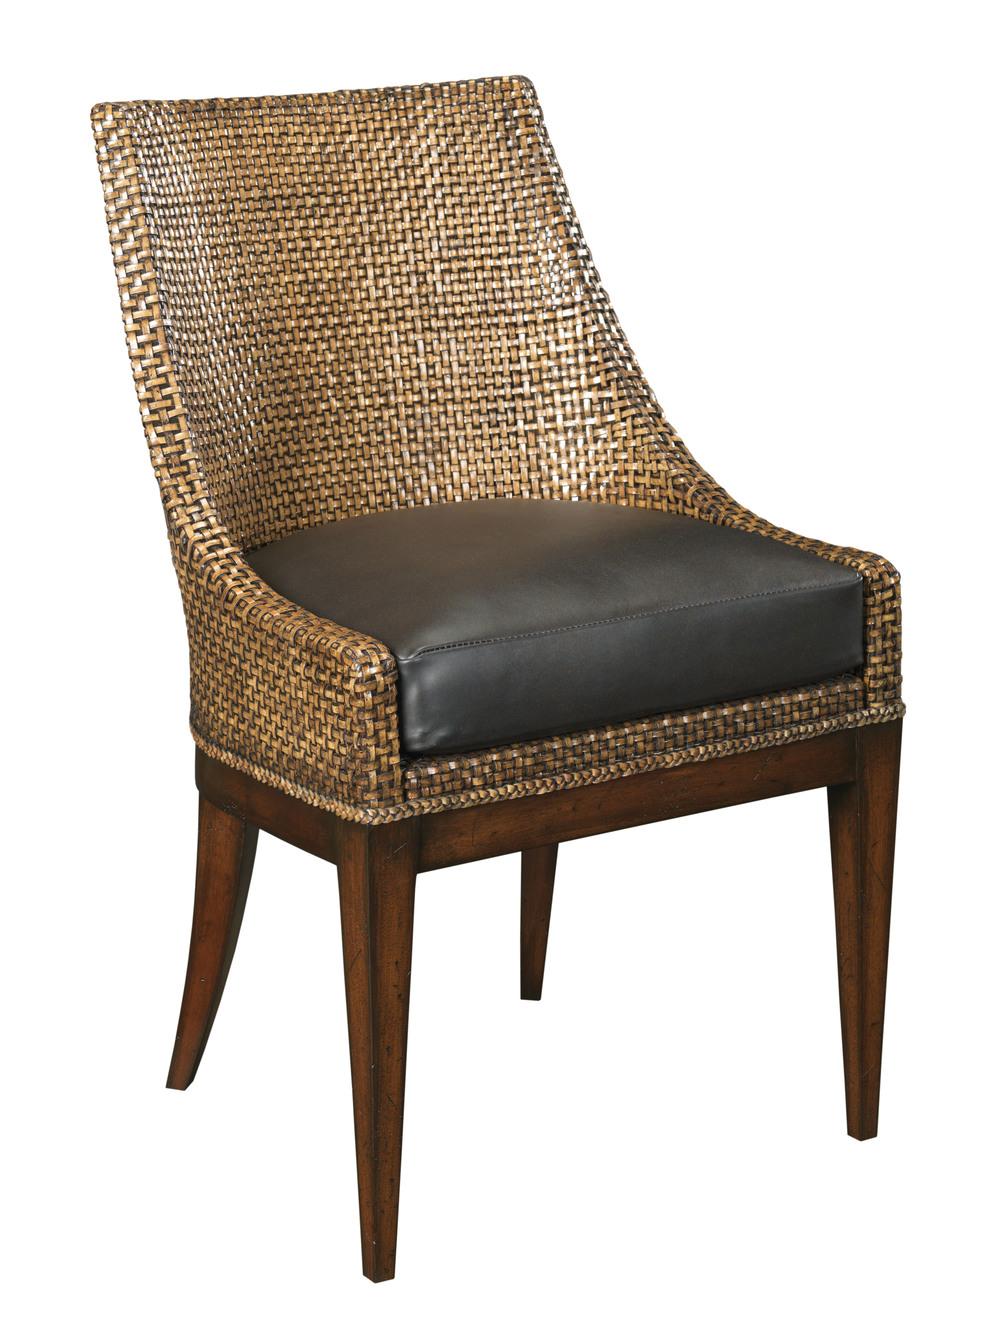 Woodbridge Furniture Company - Woven Leather Chair